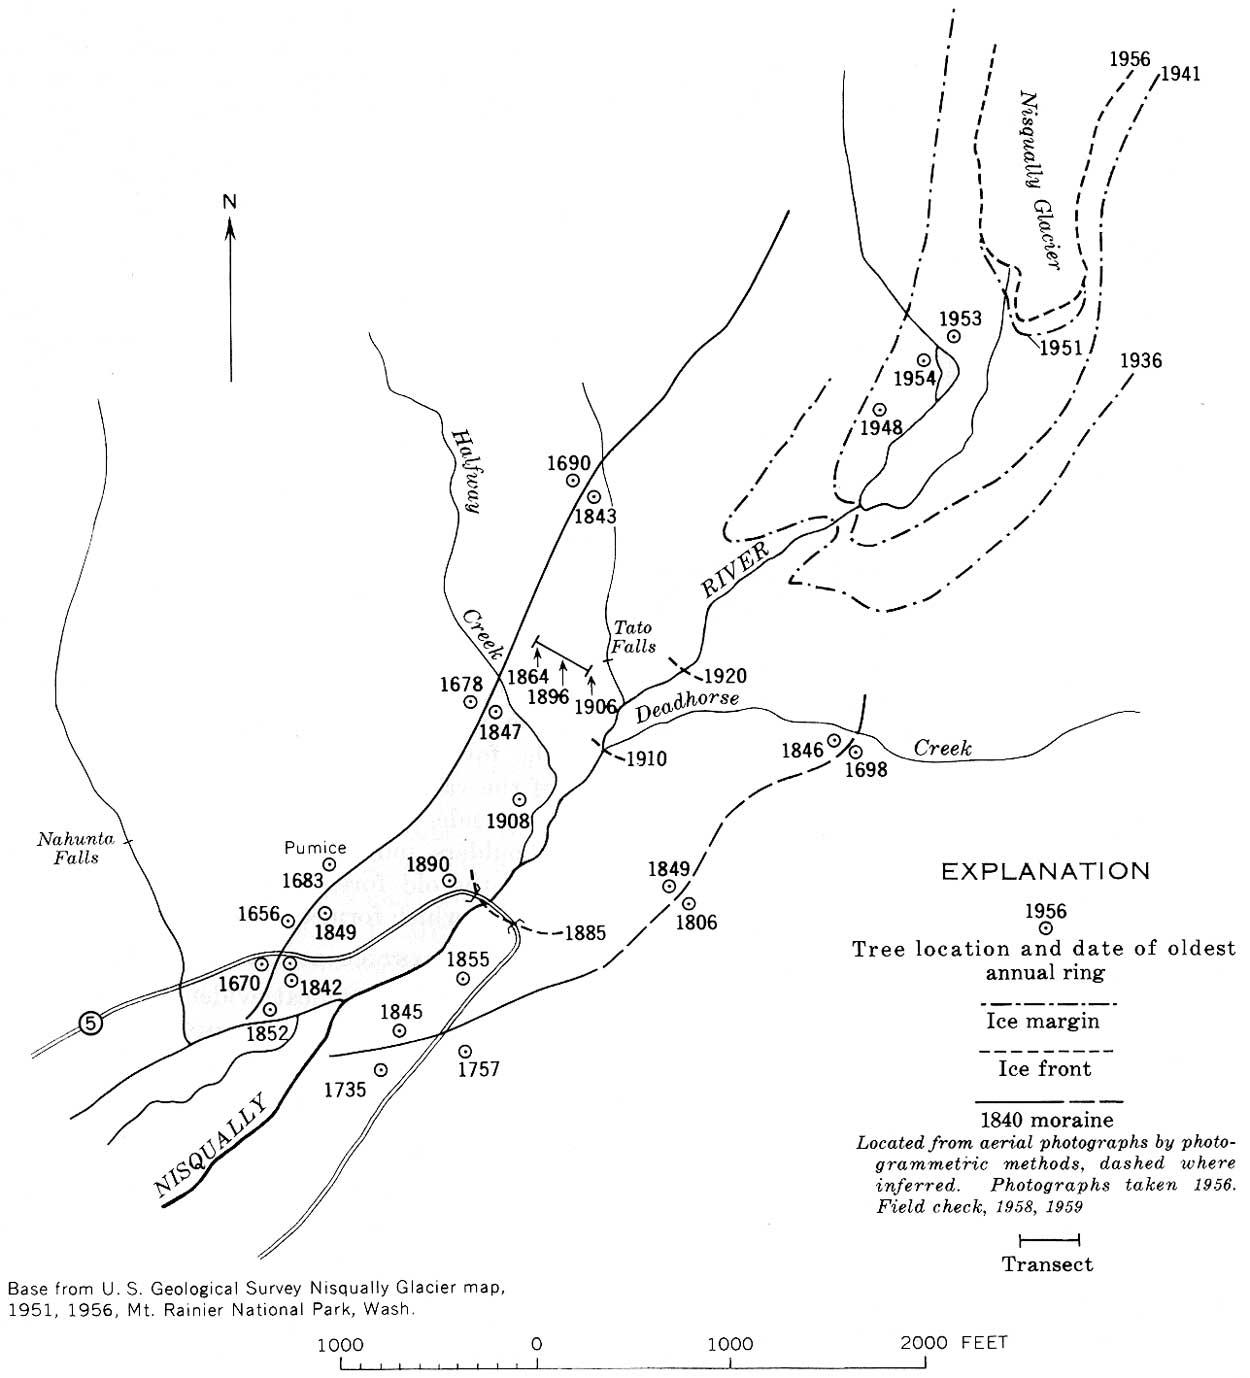 USGS: Geological Survey Professional Paper 387-A (Contents)